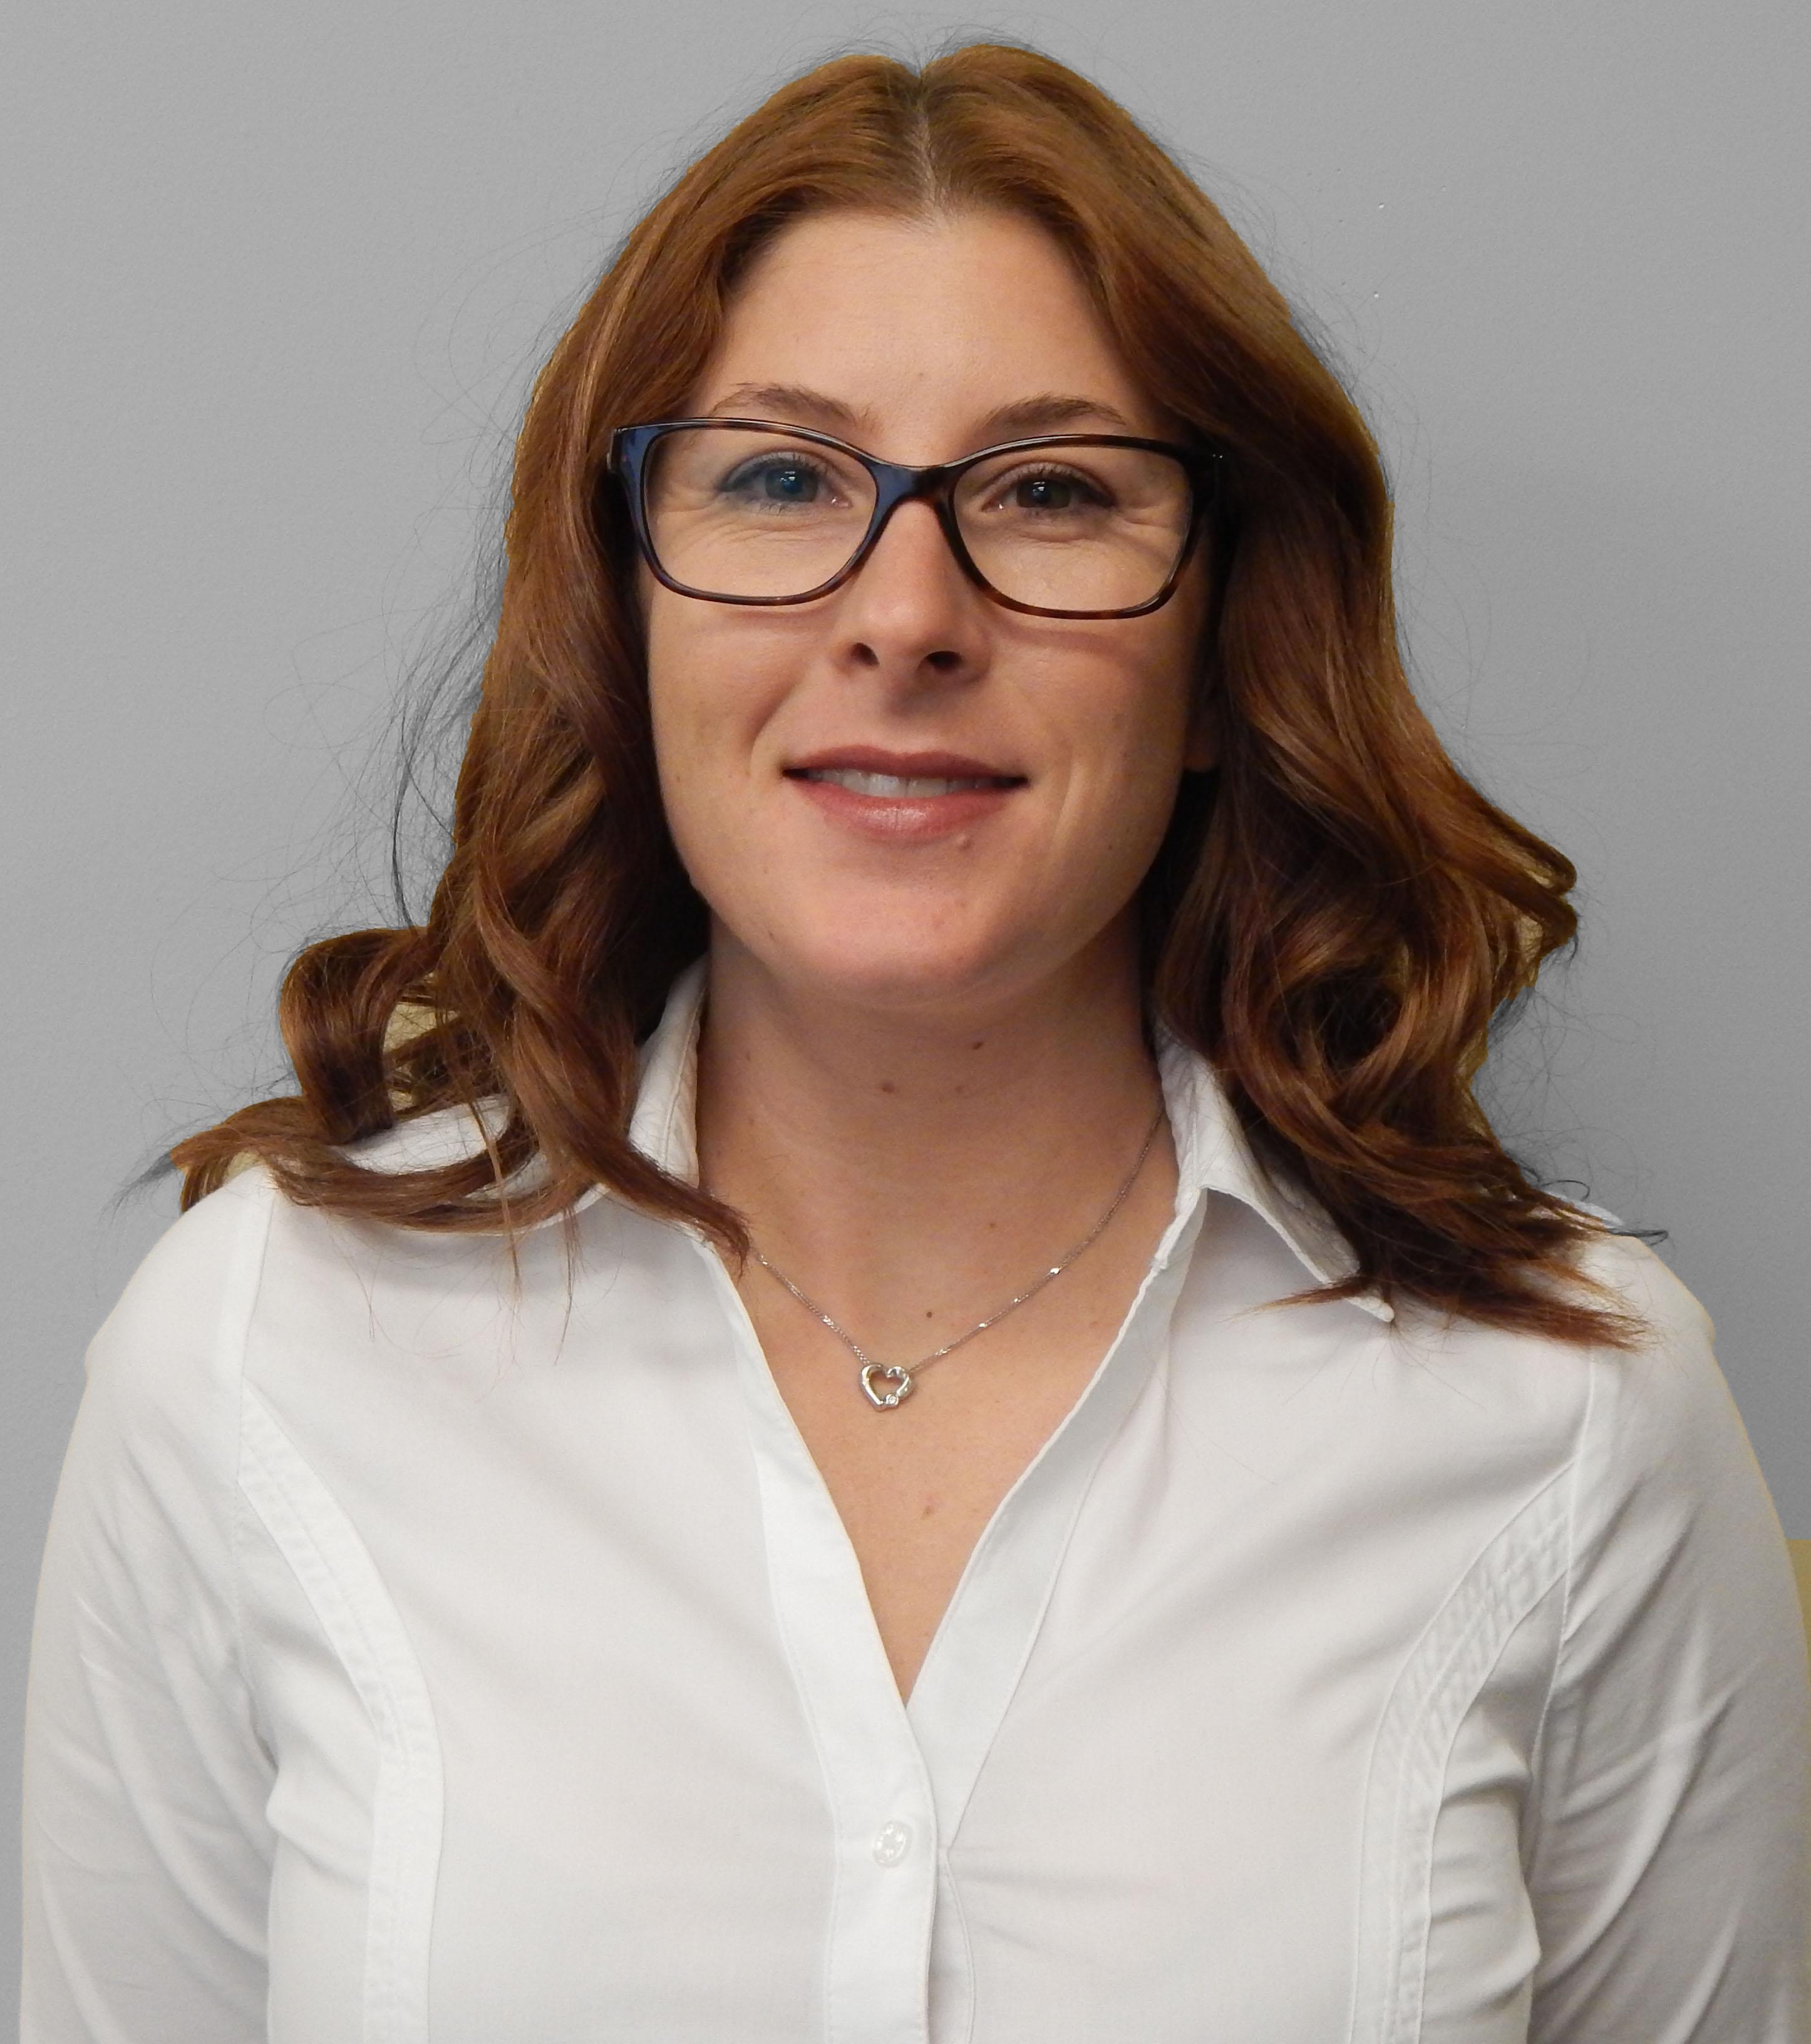 Jennifer Wickboldt